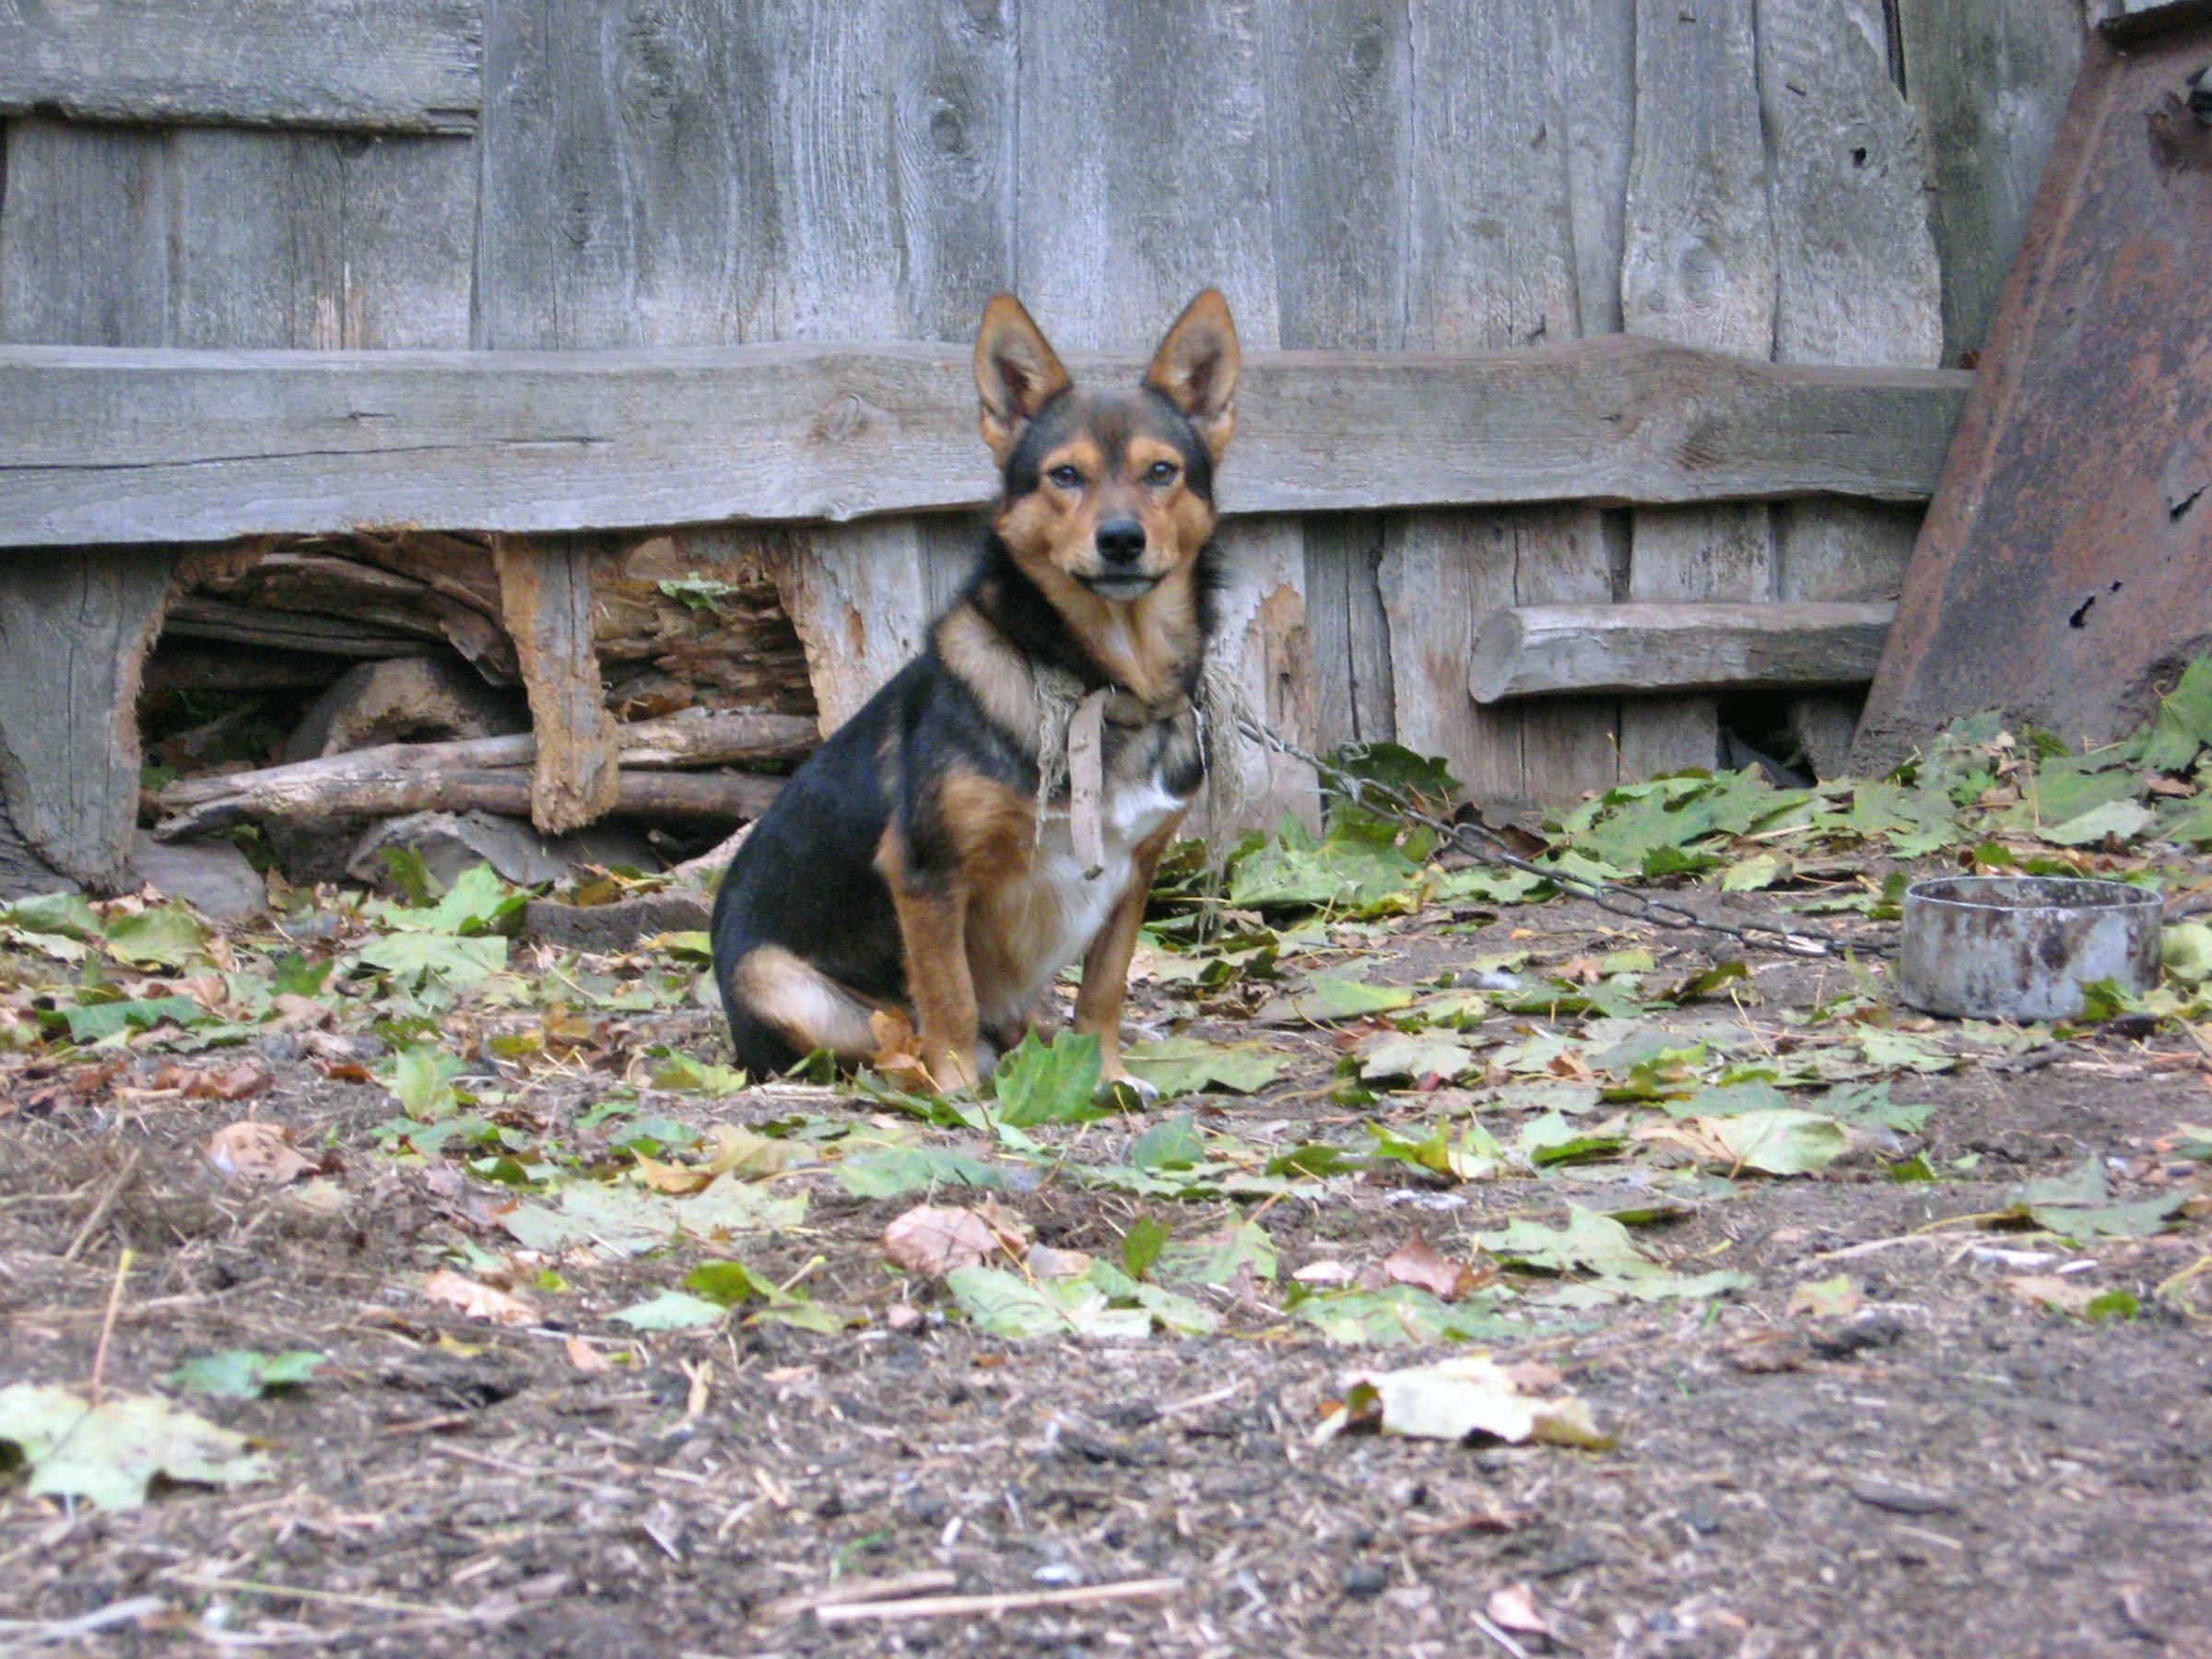 Dog, Animal, K9, Mammal, Pet, HQ Photo